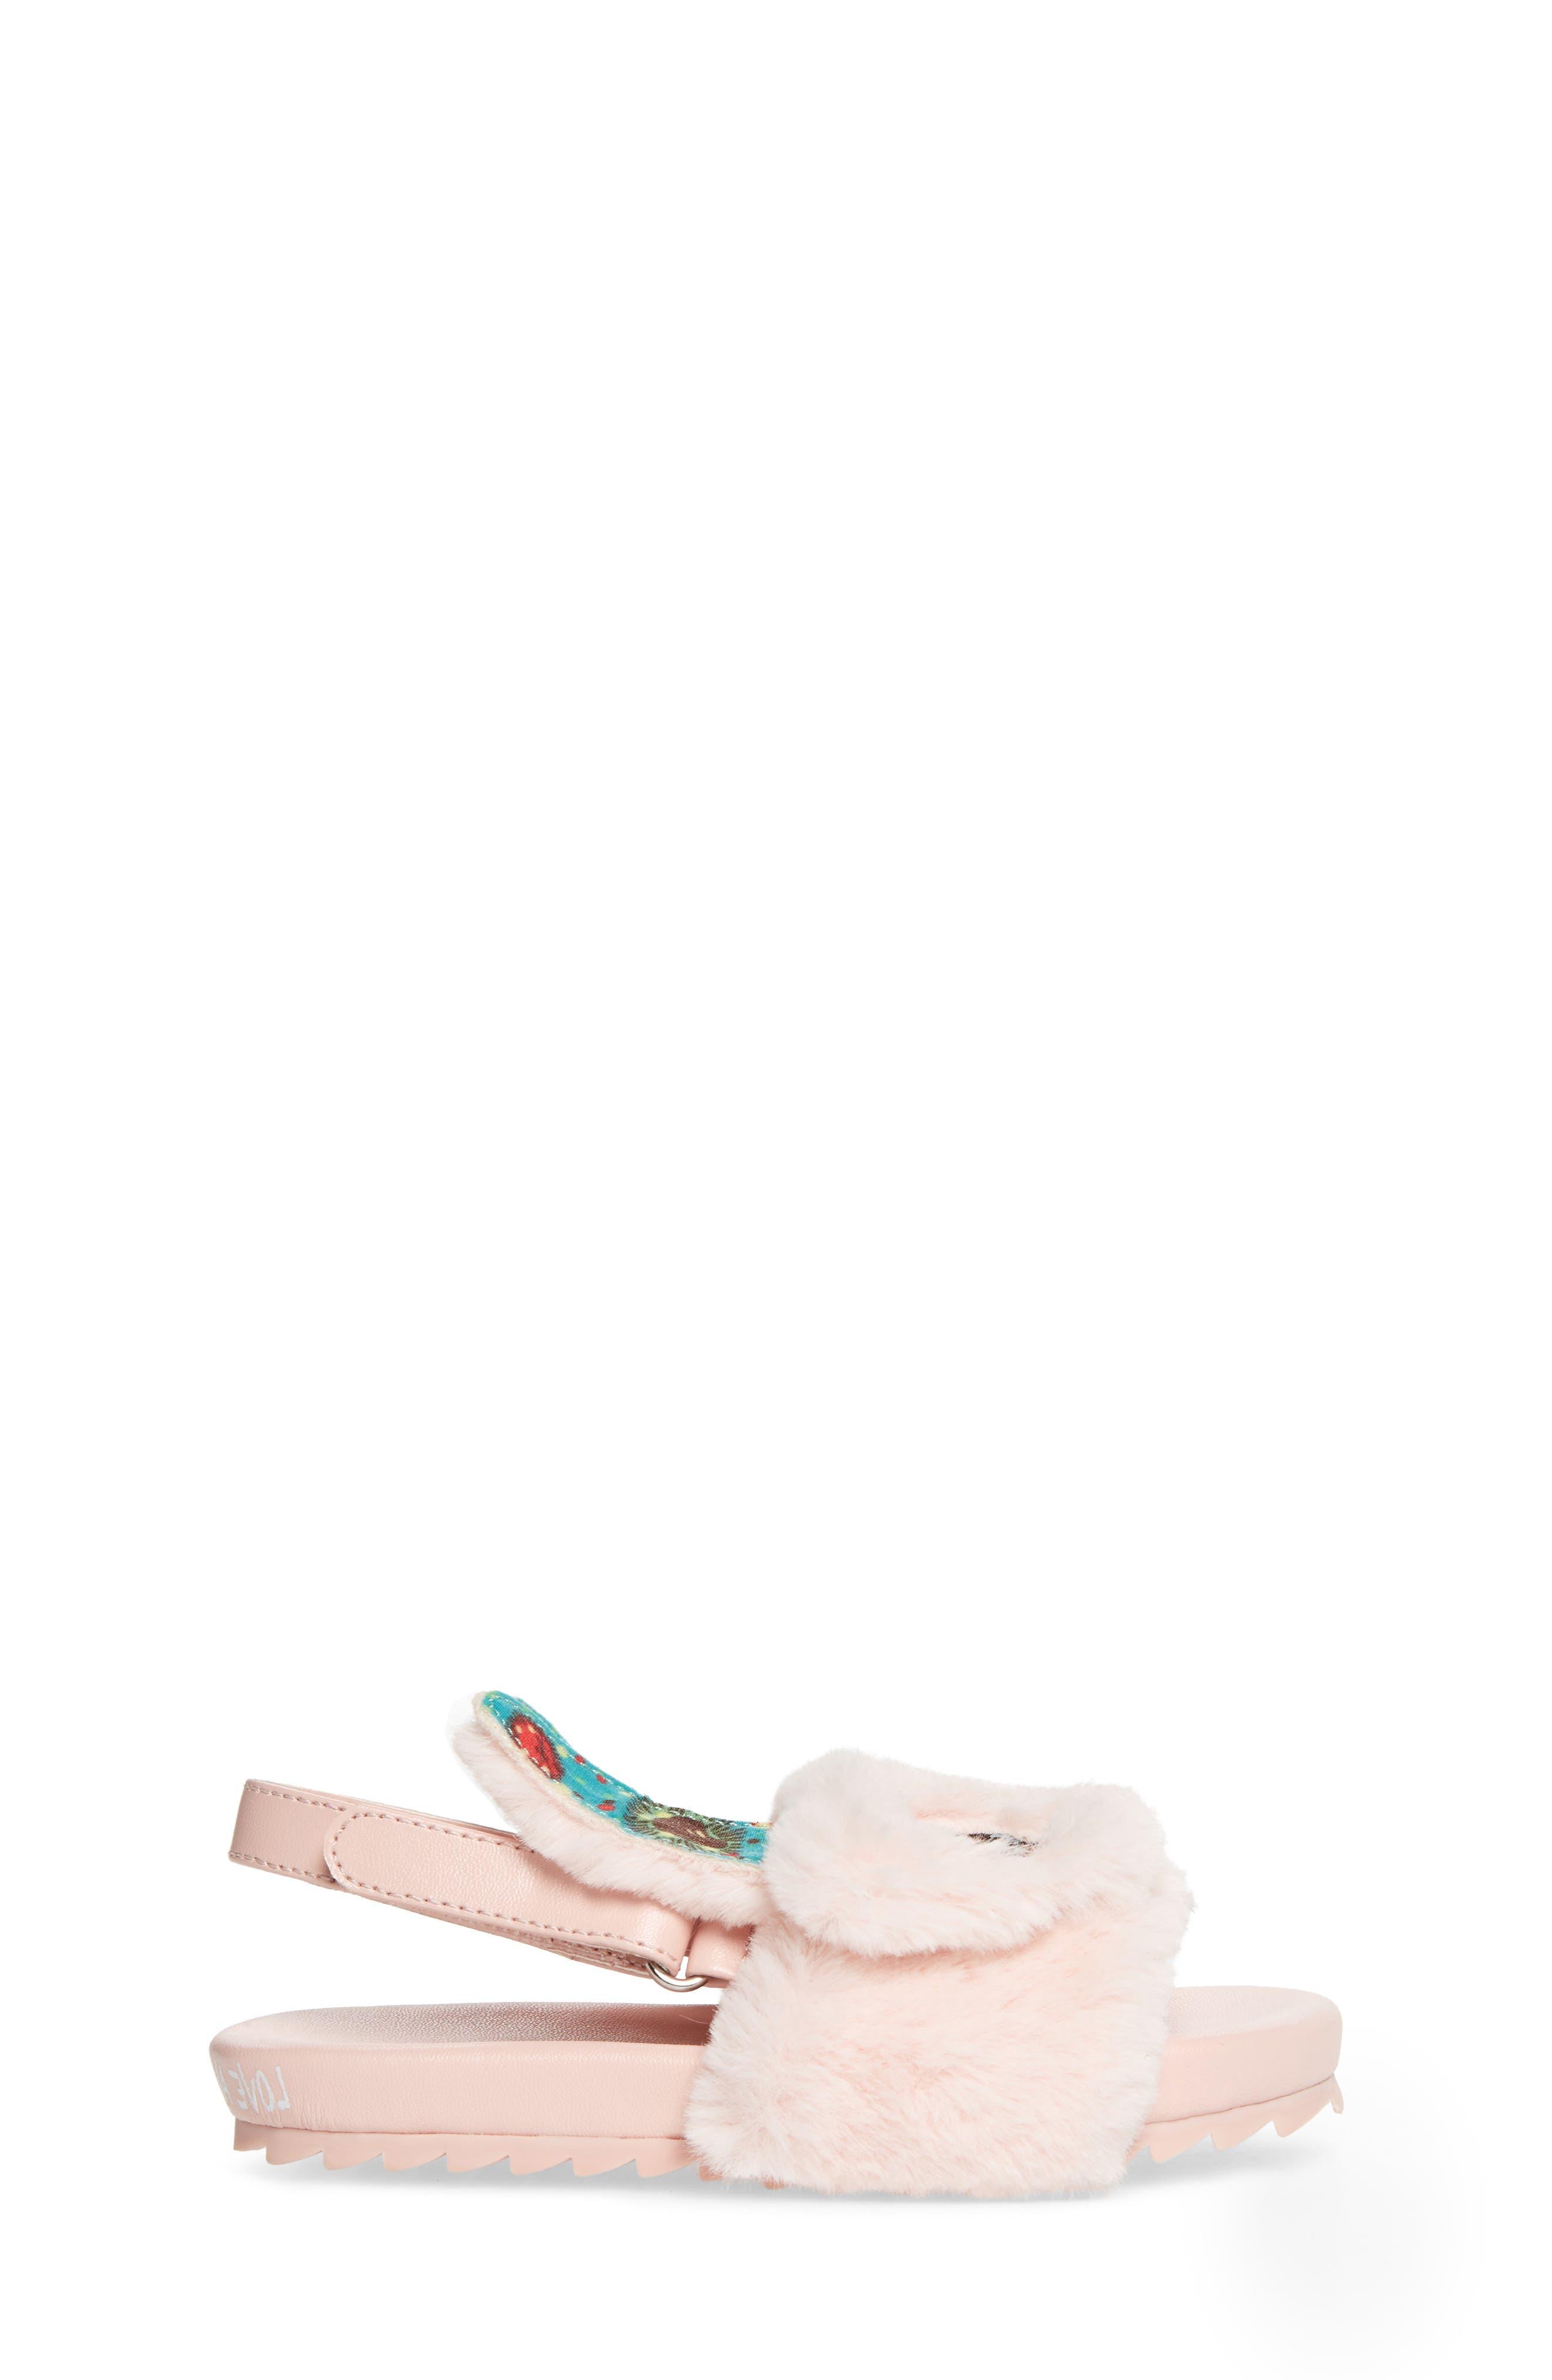 Willa Carrot Faux Fur Strap Slide Sandal,                             Alternate thumbnail 3, color,                             697